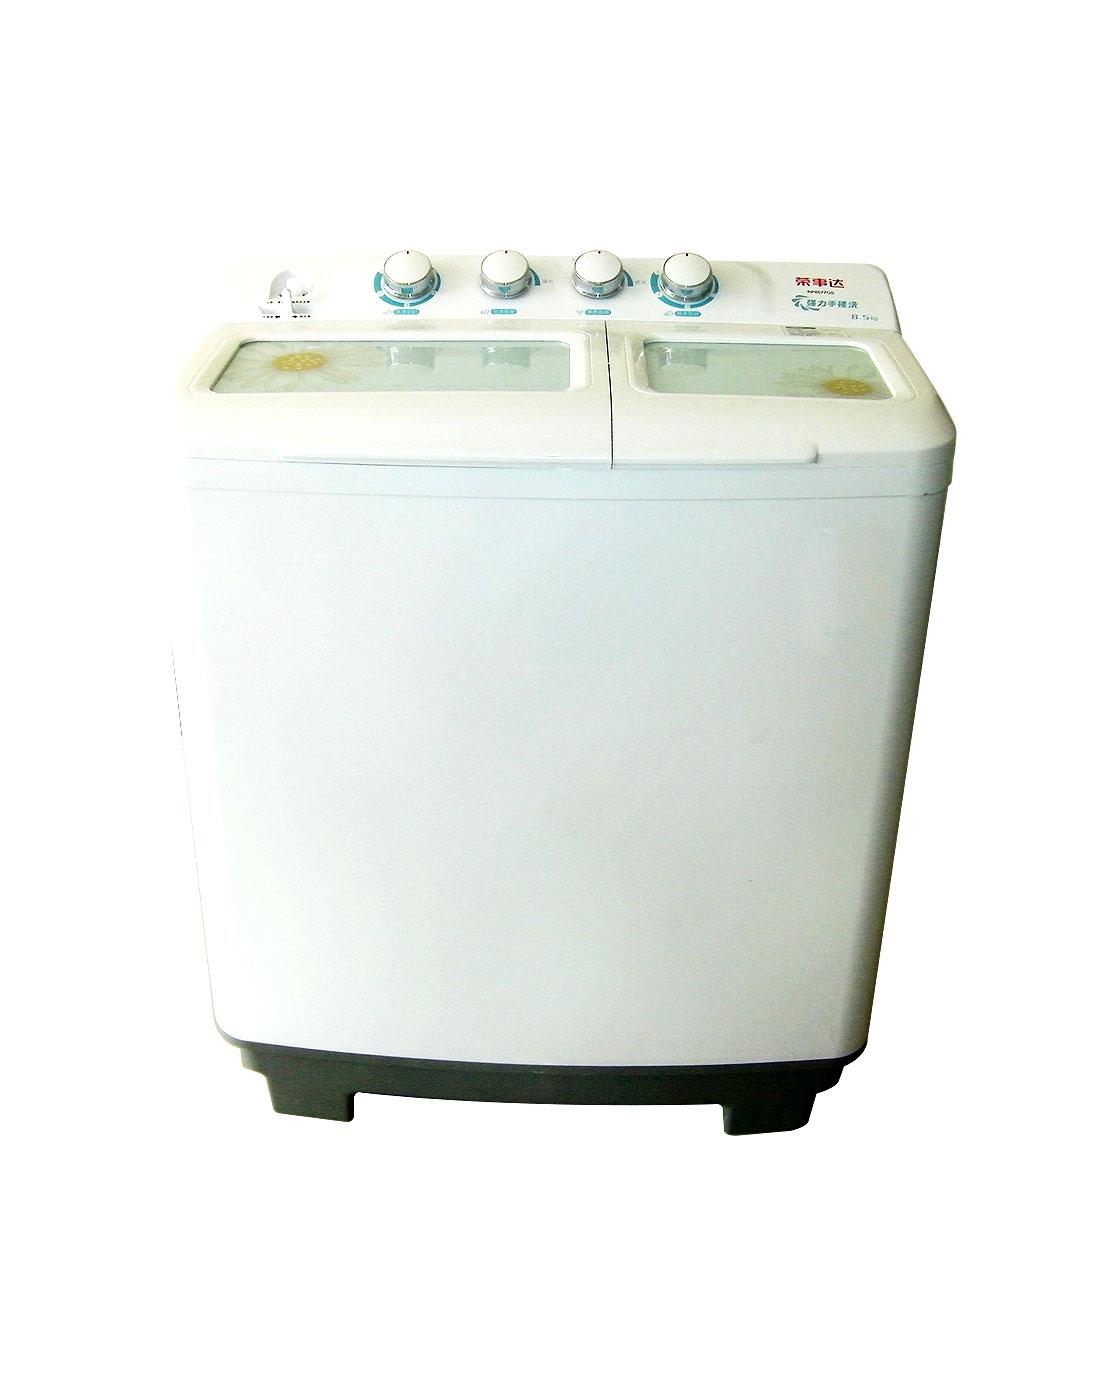 xpb85-72s双桶洗衣机接线图